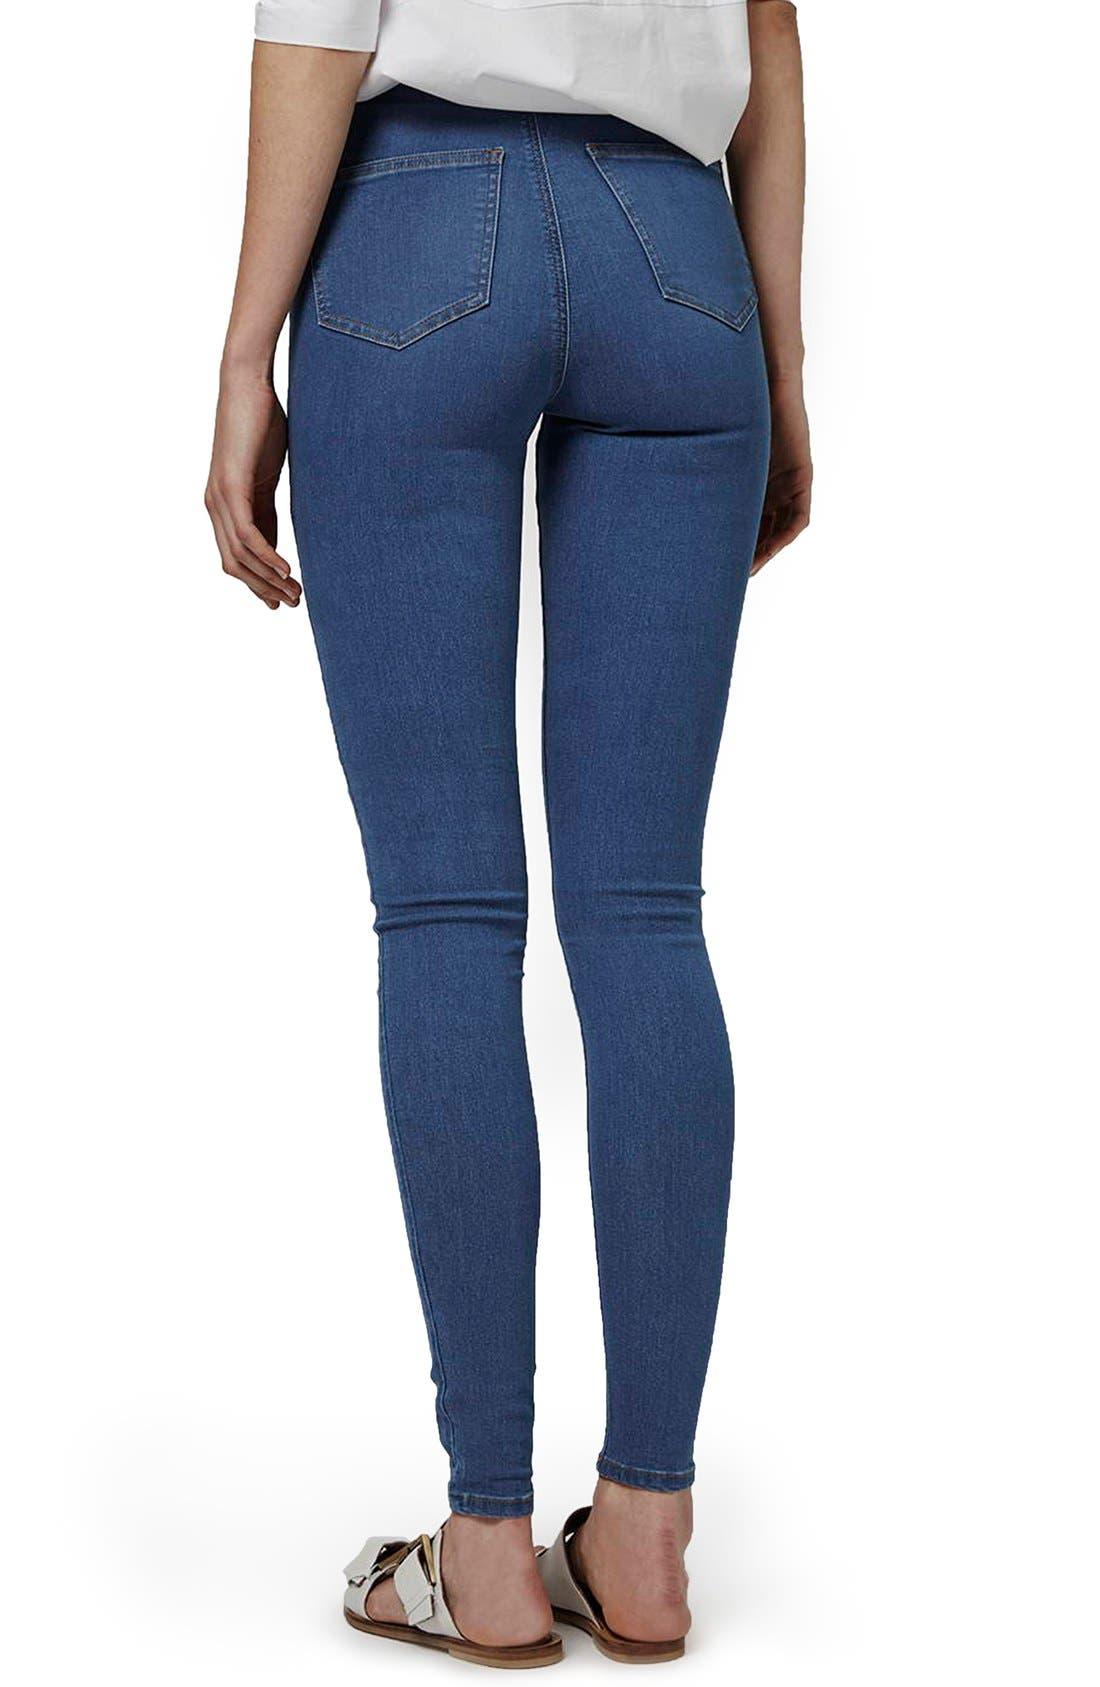 'Joni' High Waist Skinny Jeans,                             Alternate thumbnail 4, color,                             400